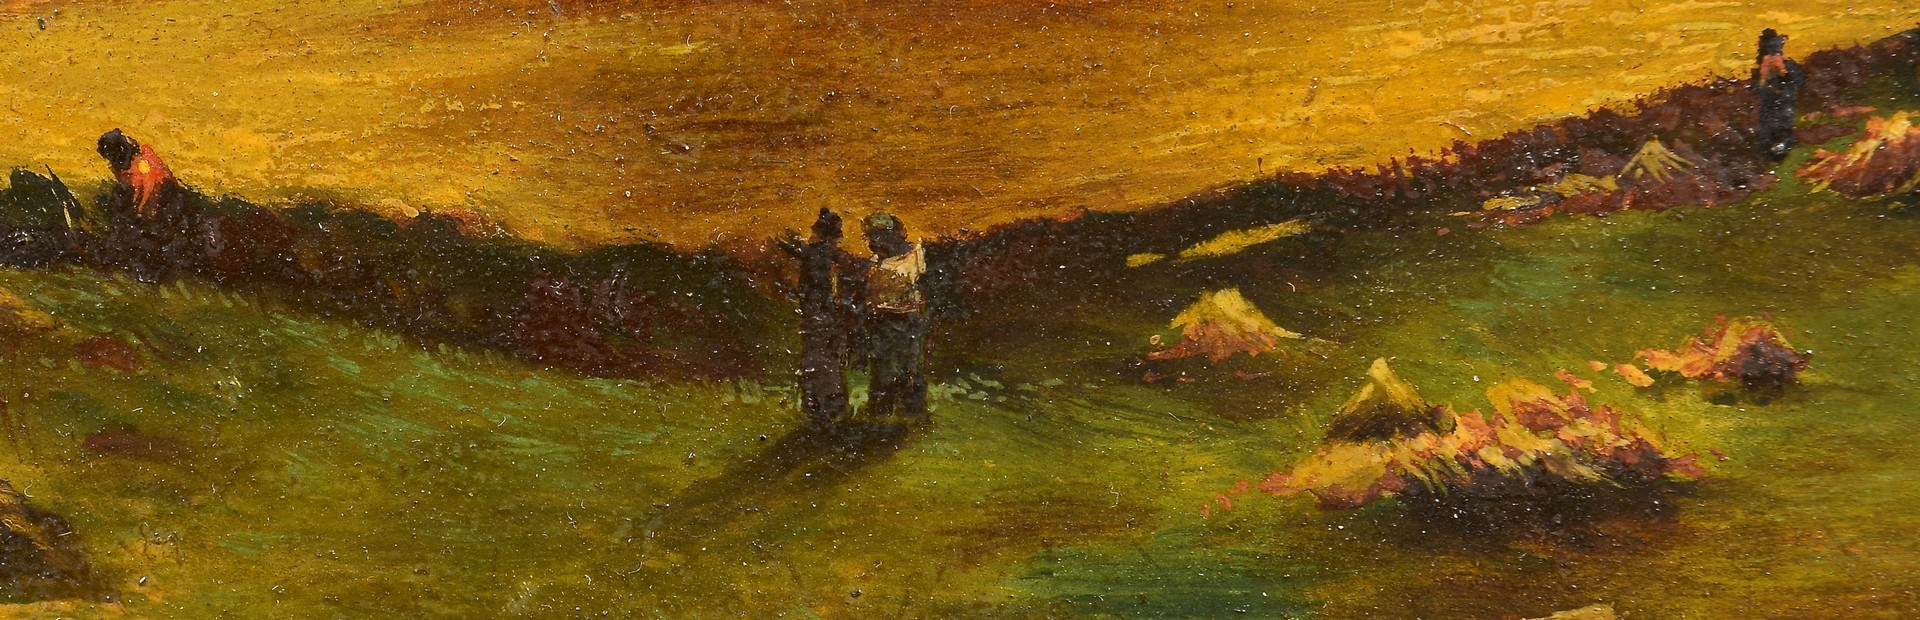 Lot 4010220: Gandenberger oil on board farm landscape